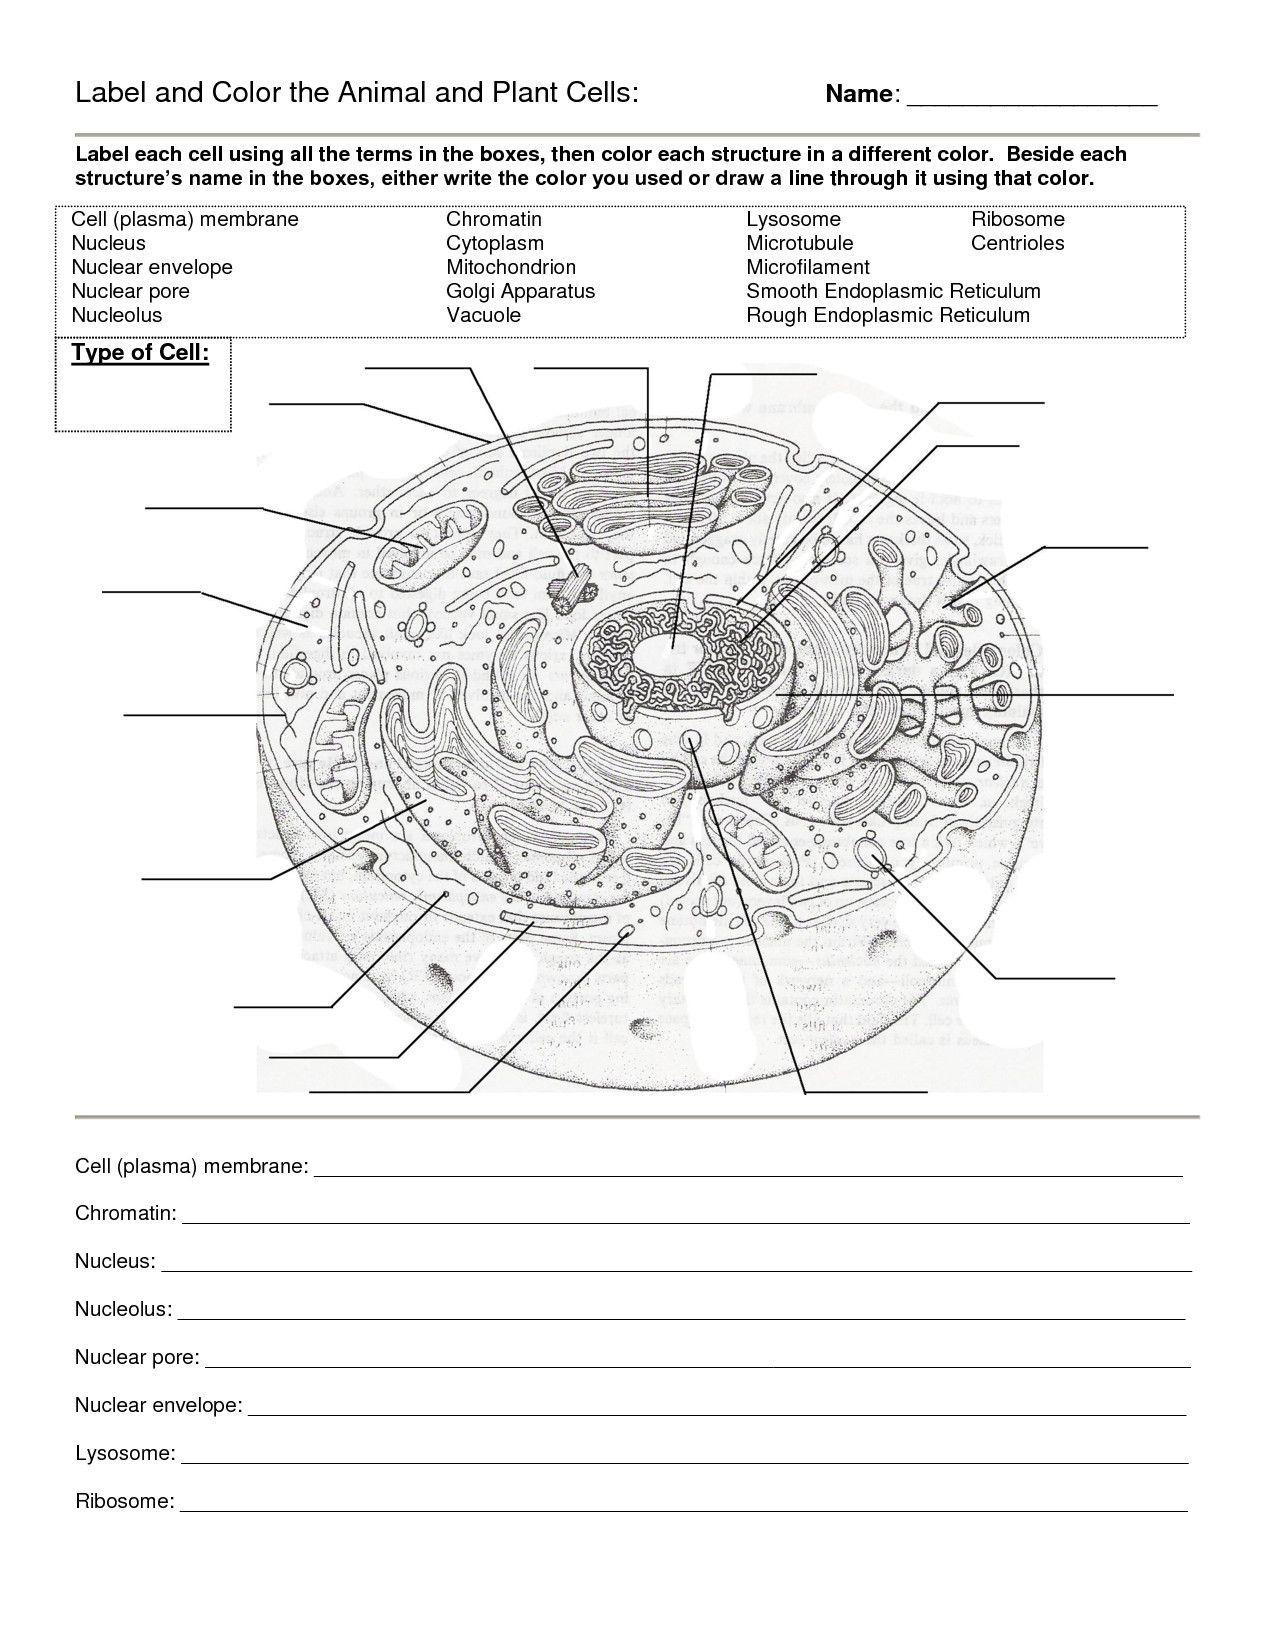 Transport Across Membranes Worksheet Answers